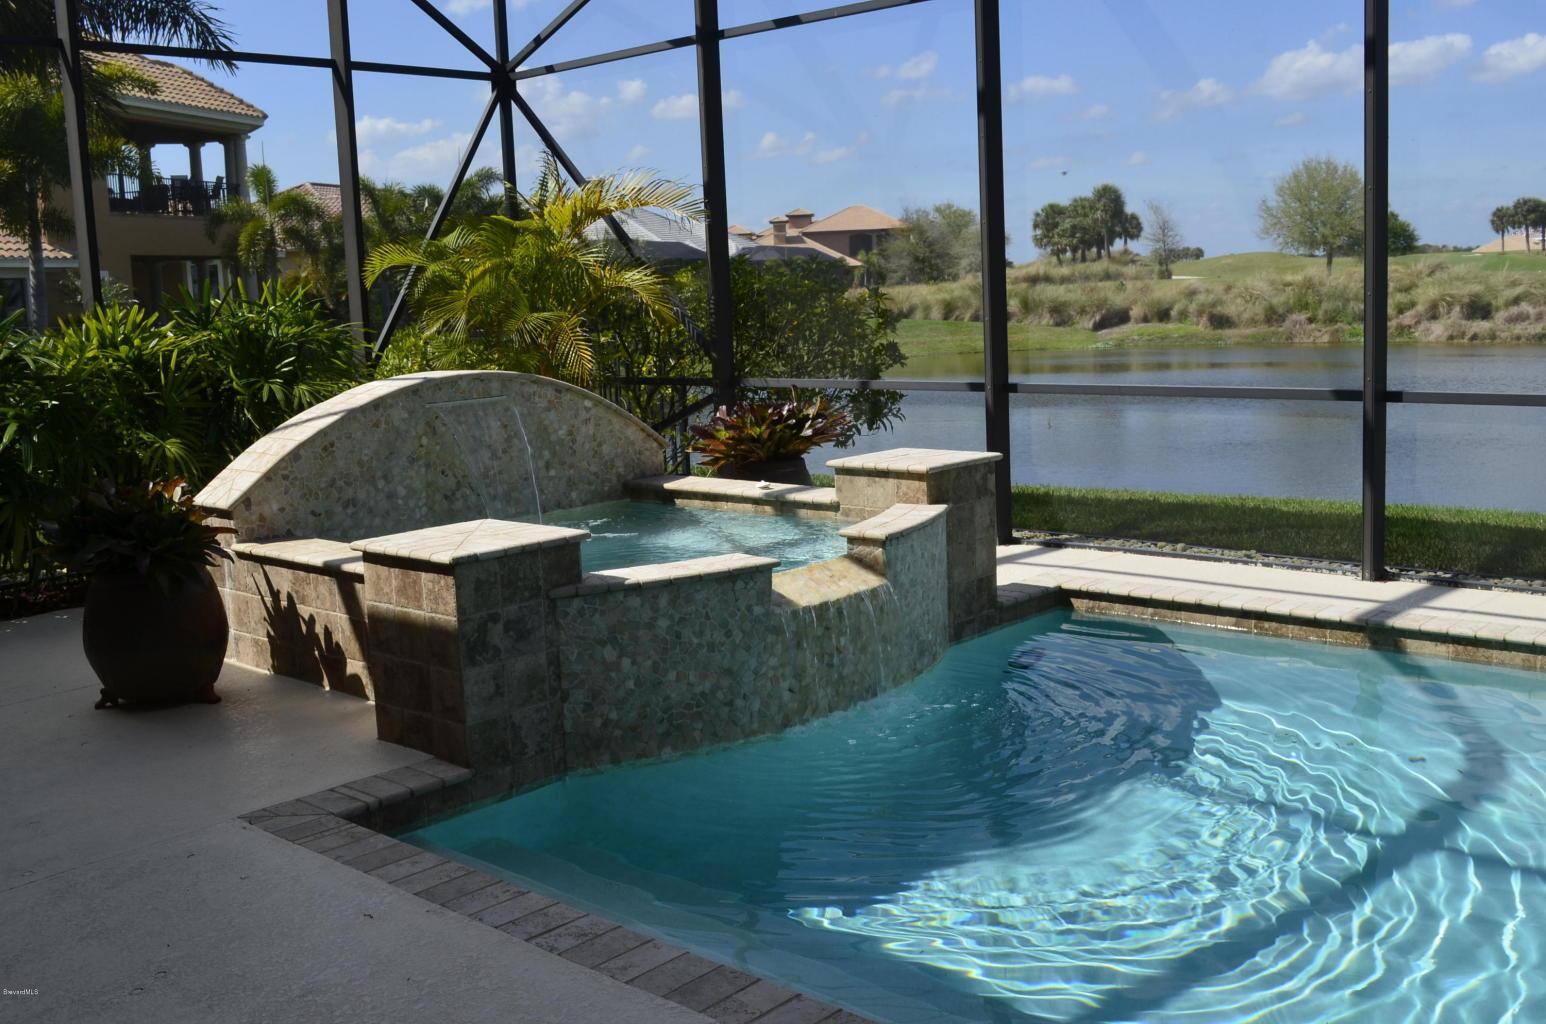 Palm beach joyal construction - Palm beach pool ...